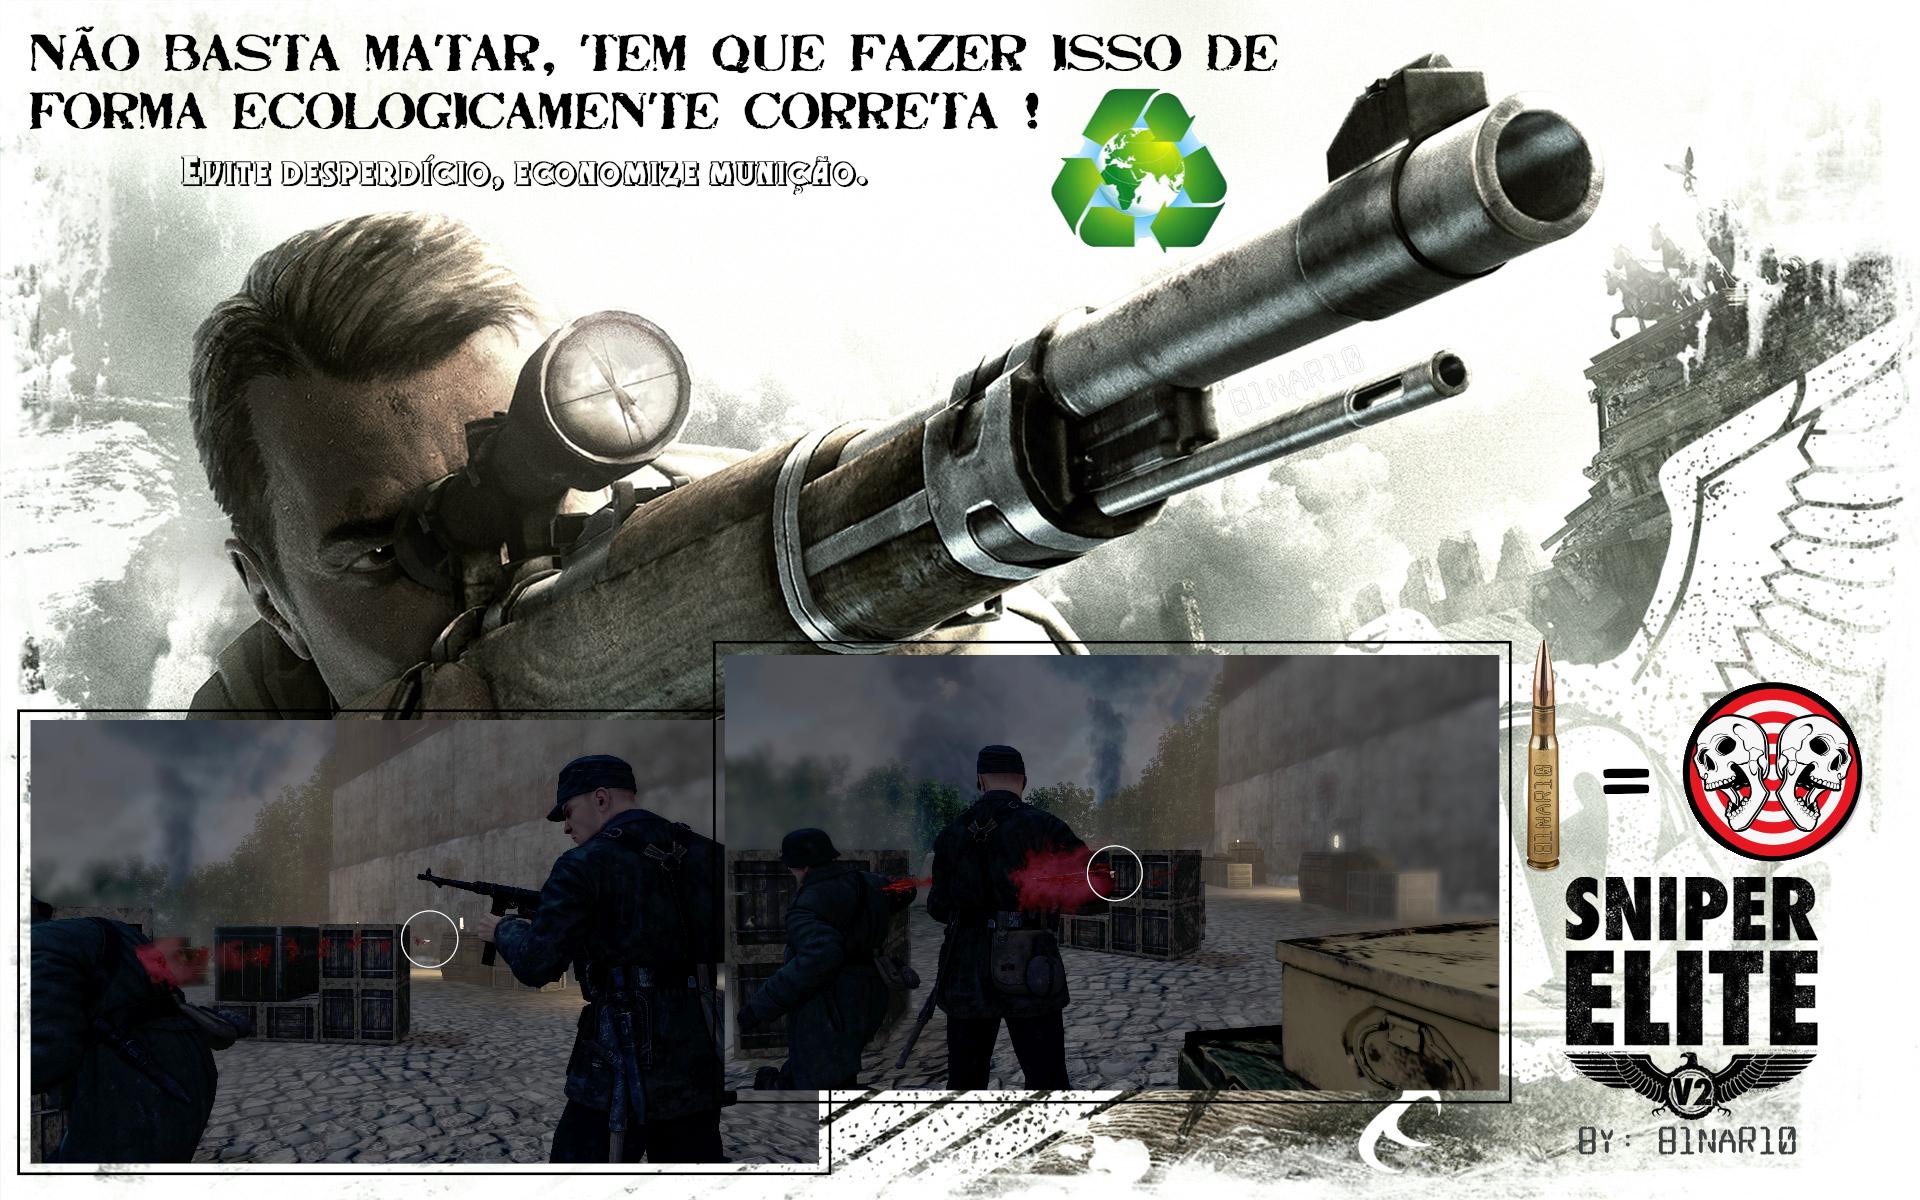 Sniper elite v2 steam unlocked ali213 crack : ucfoolnigh